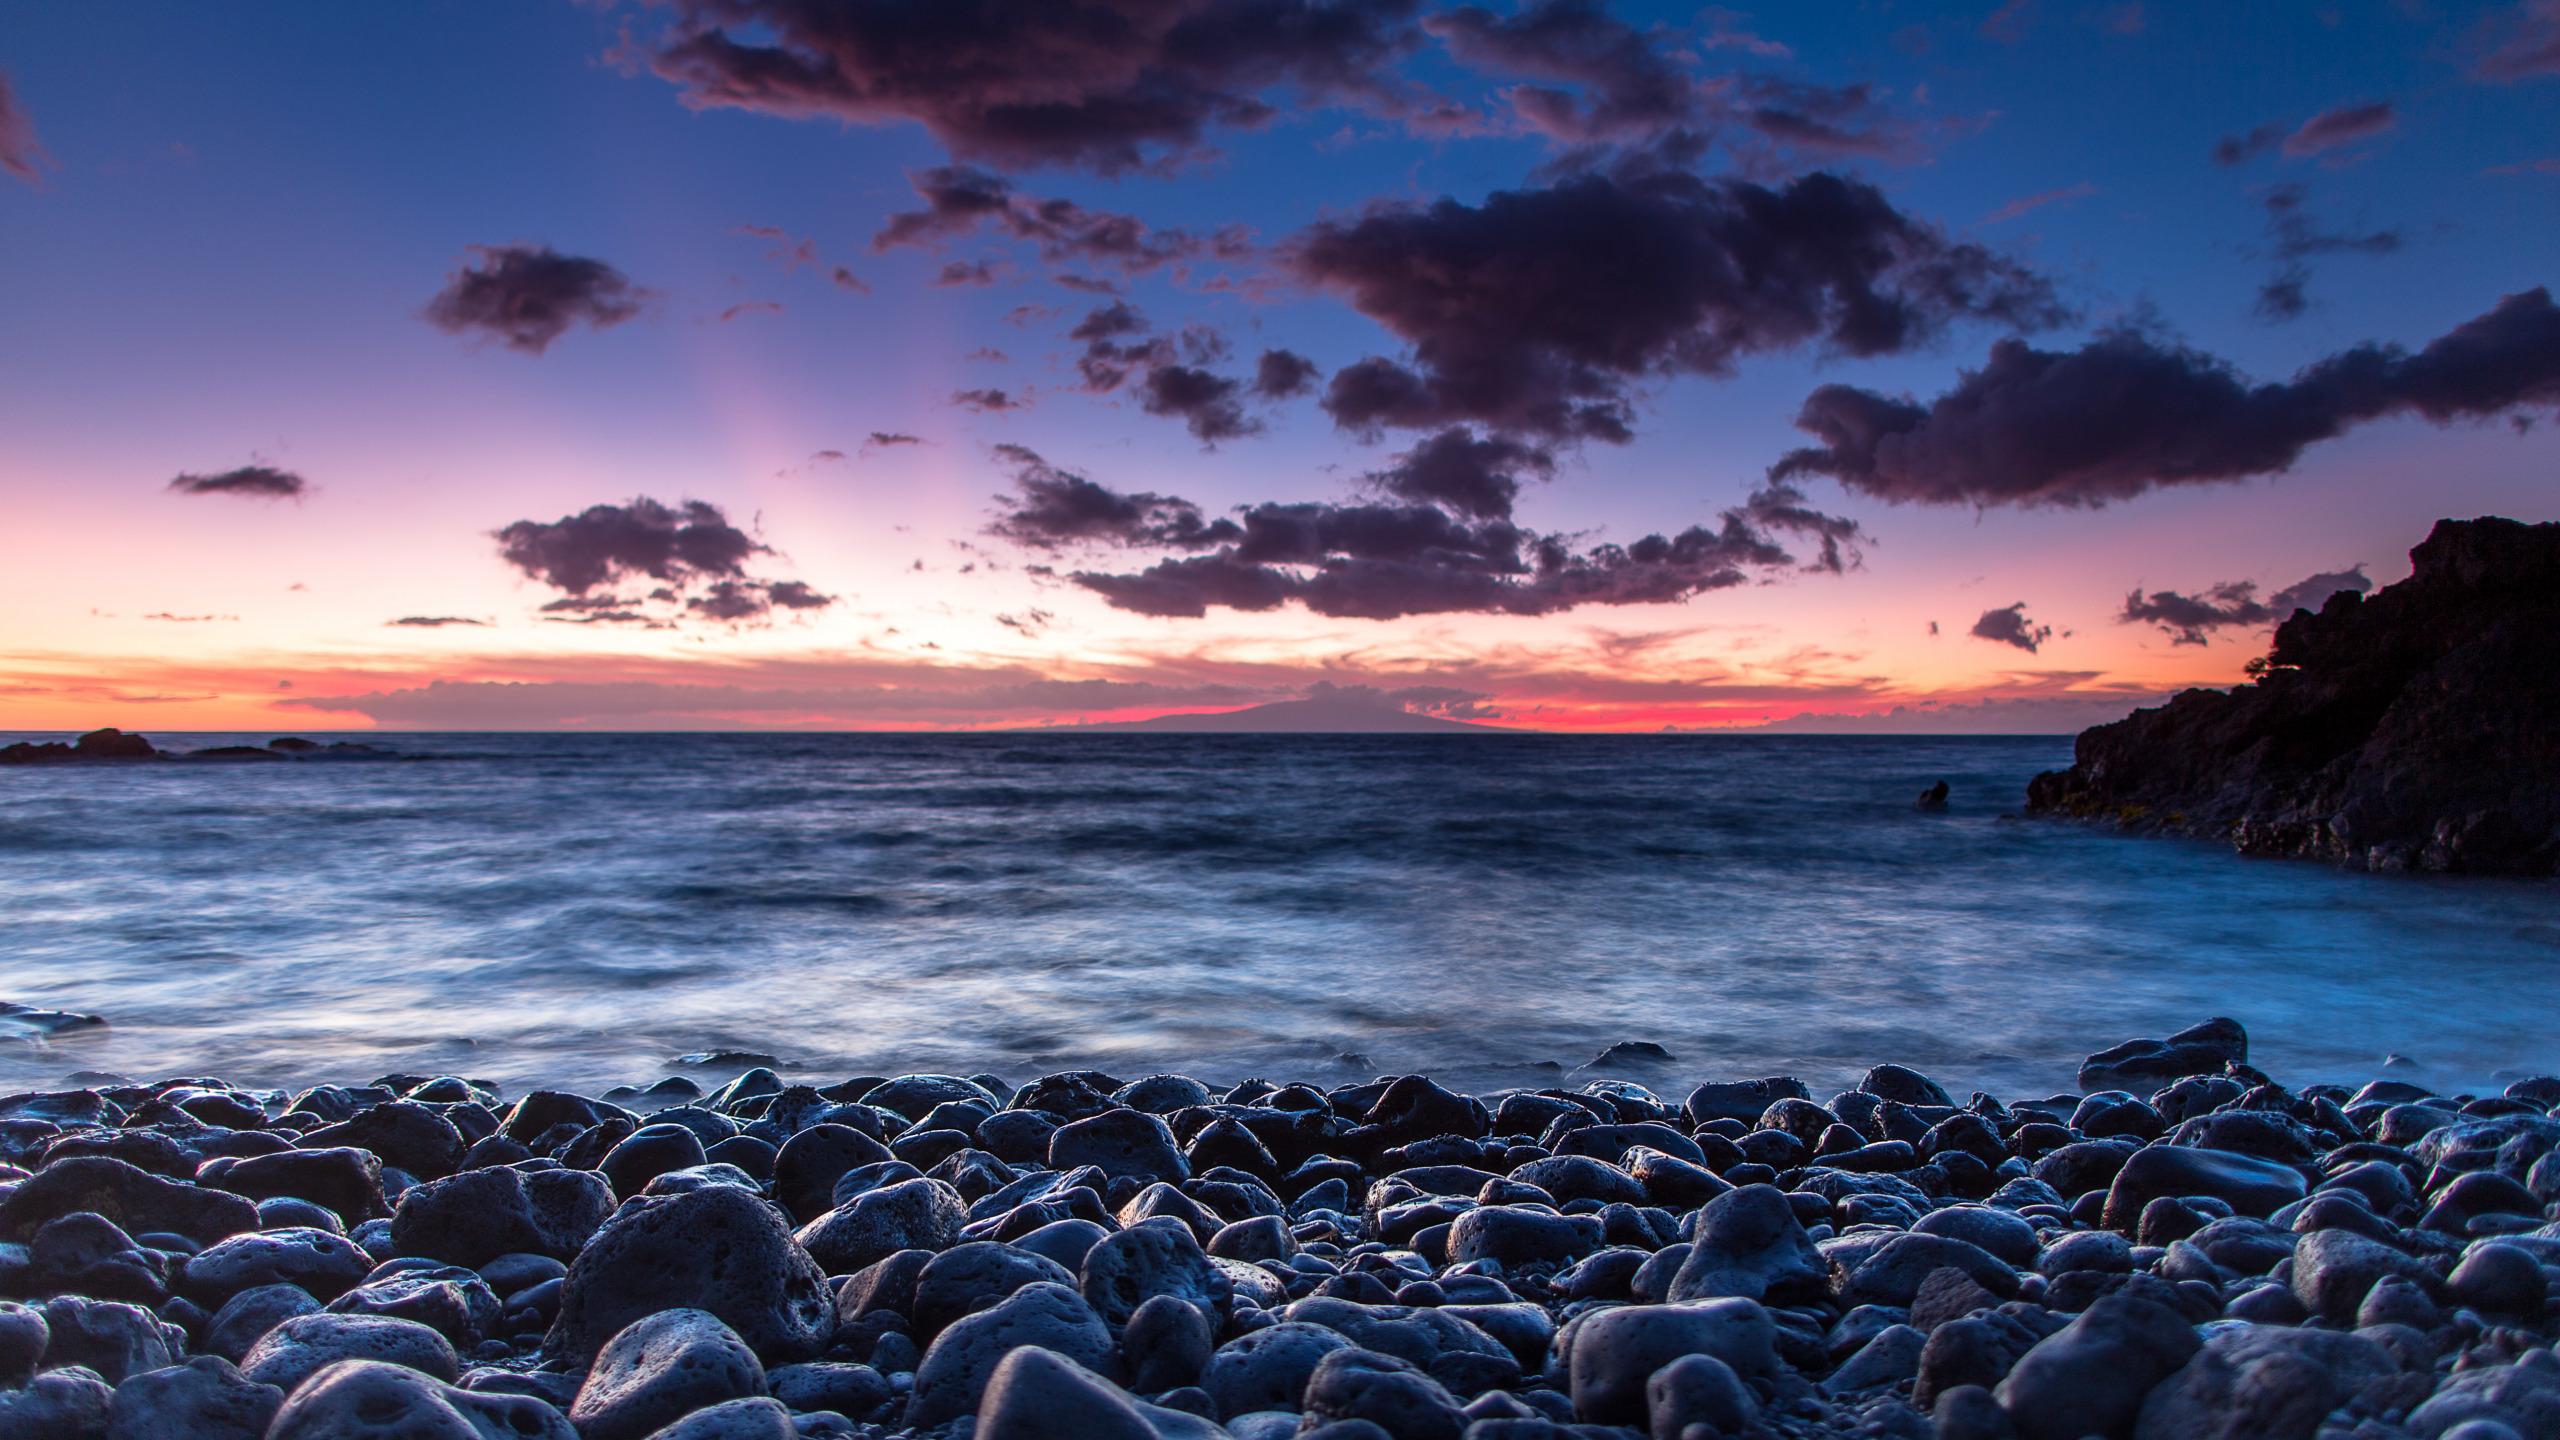 камни небо море  № 1491369 бесплатно